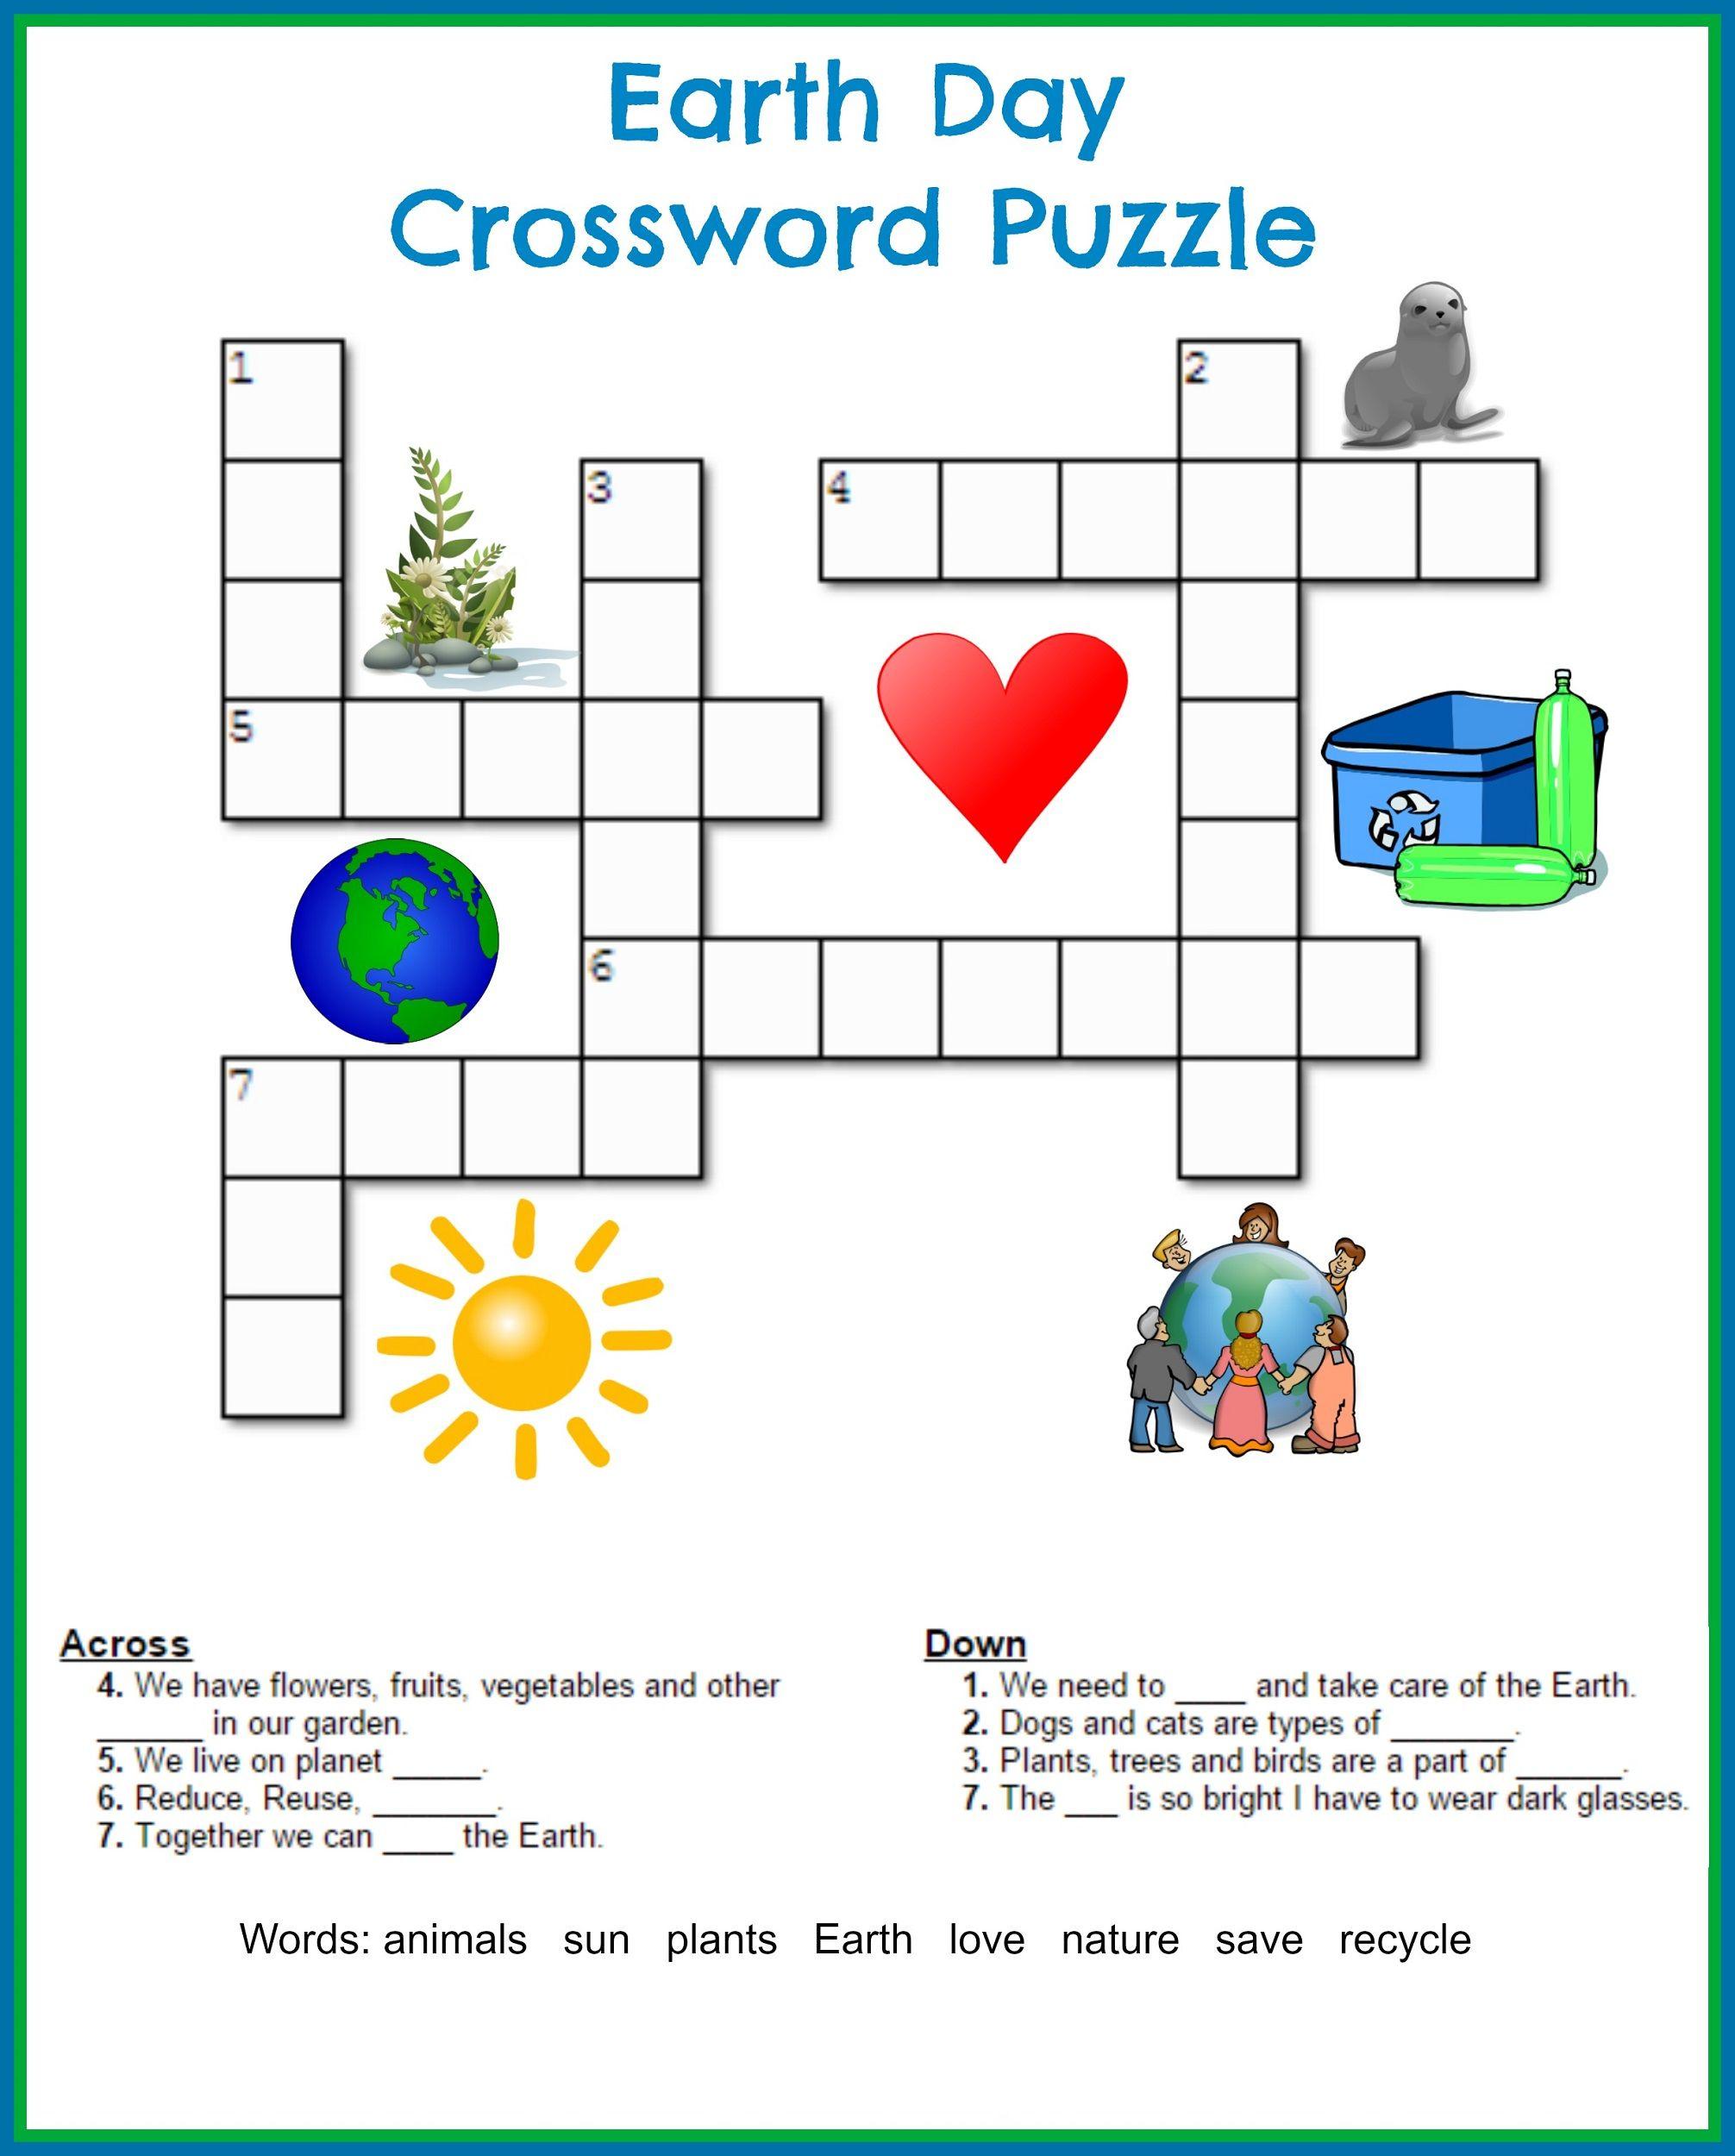 Printable Crossword Puzzles Kids | Crossword Puzzles On Earth - Printable Crossword Puzzles For Elementary Students